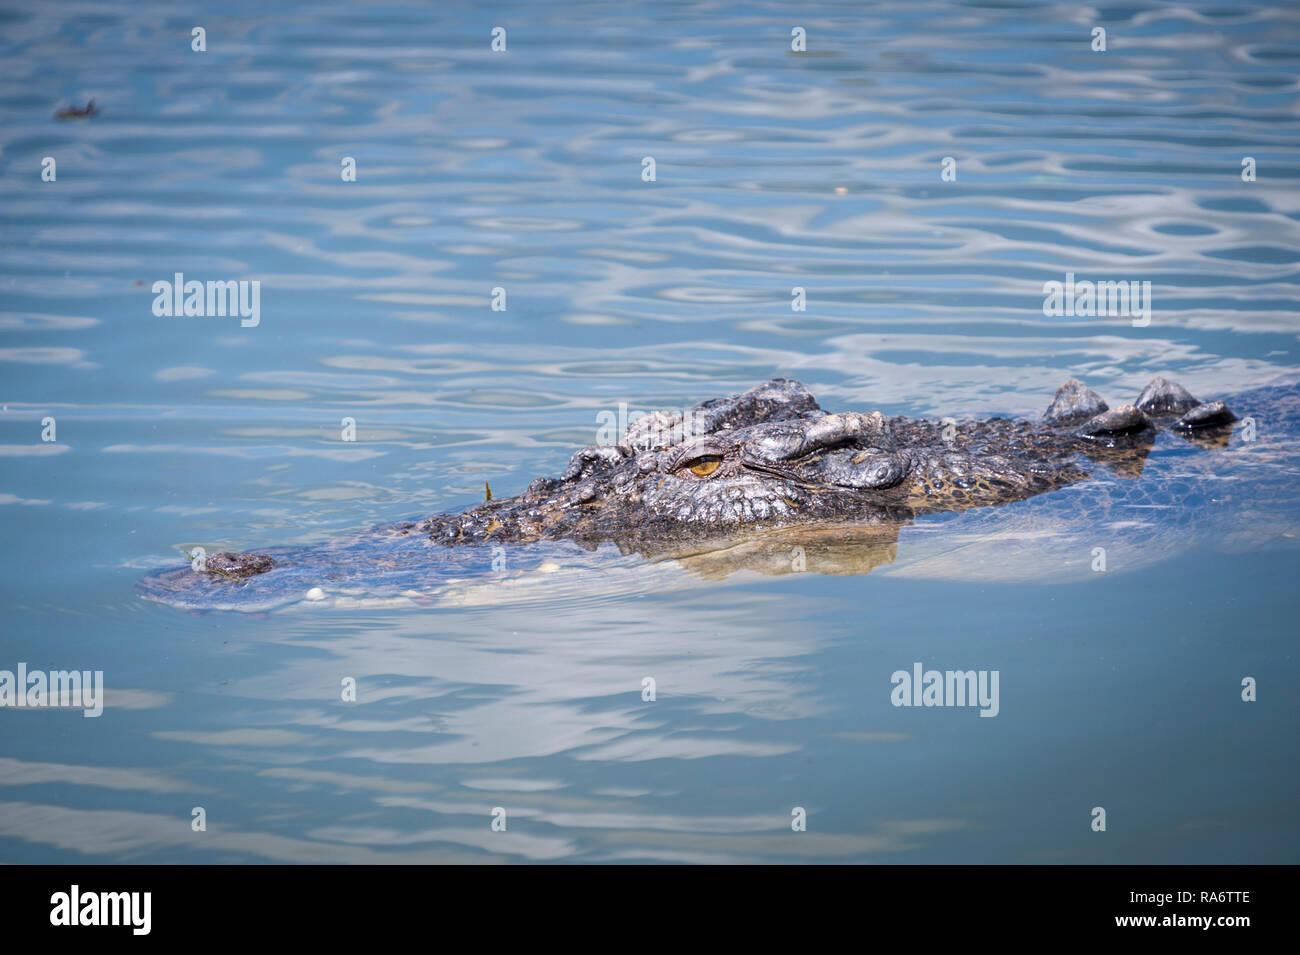 Cruising croc, Northern Territory - Stock Image